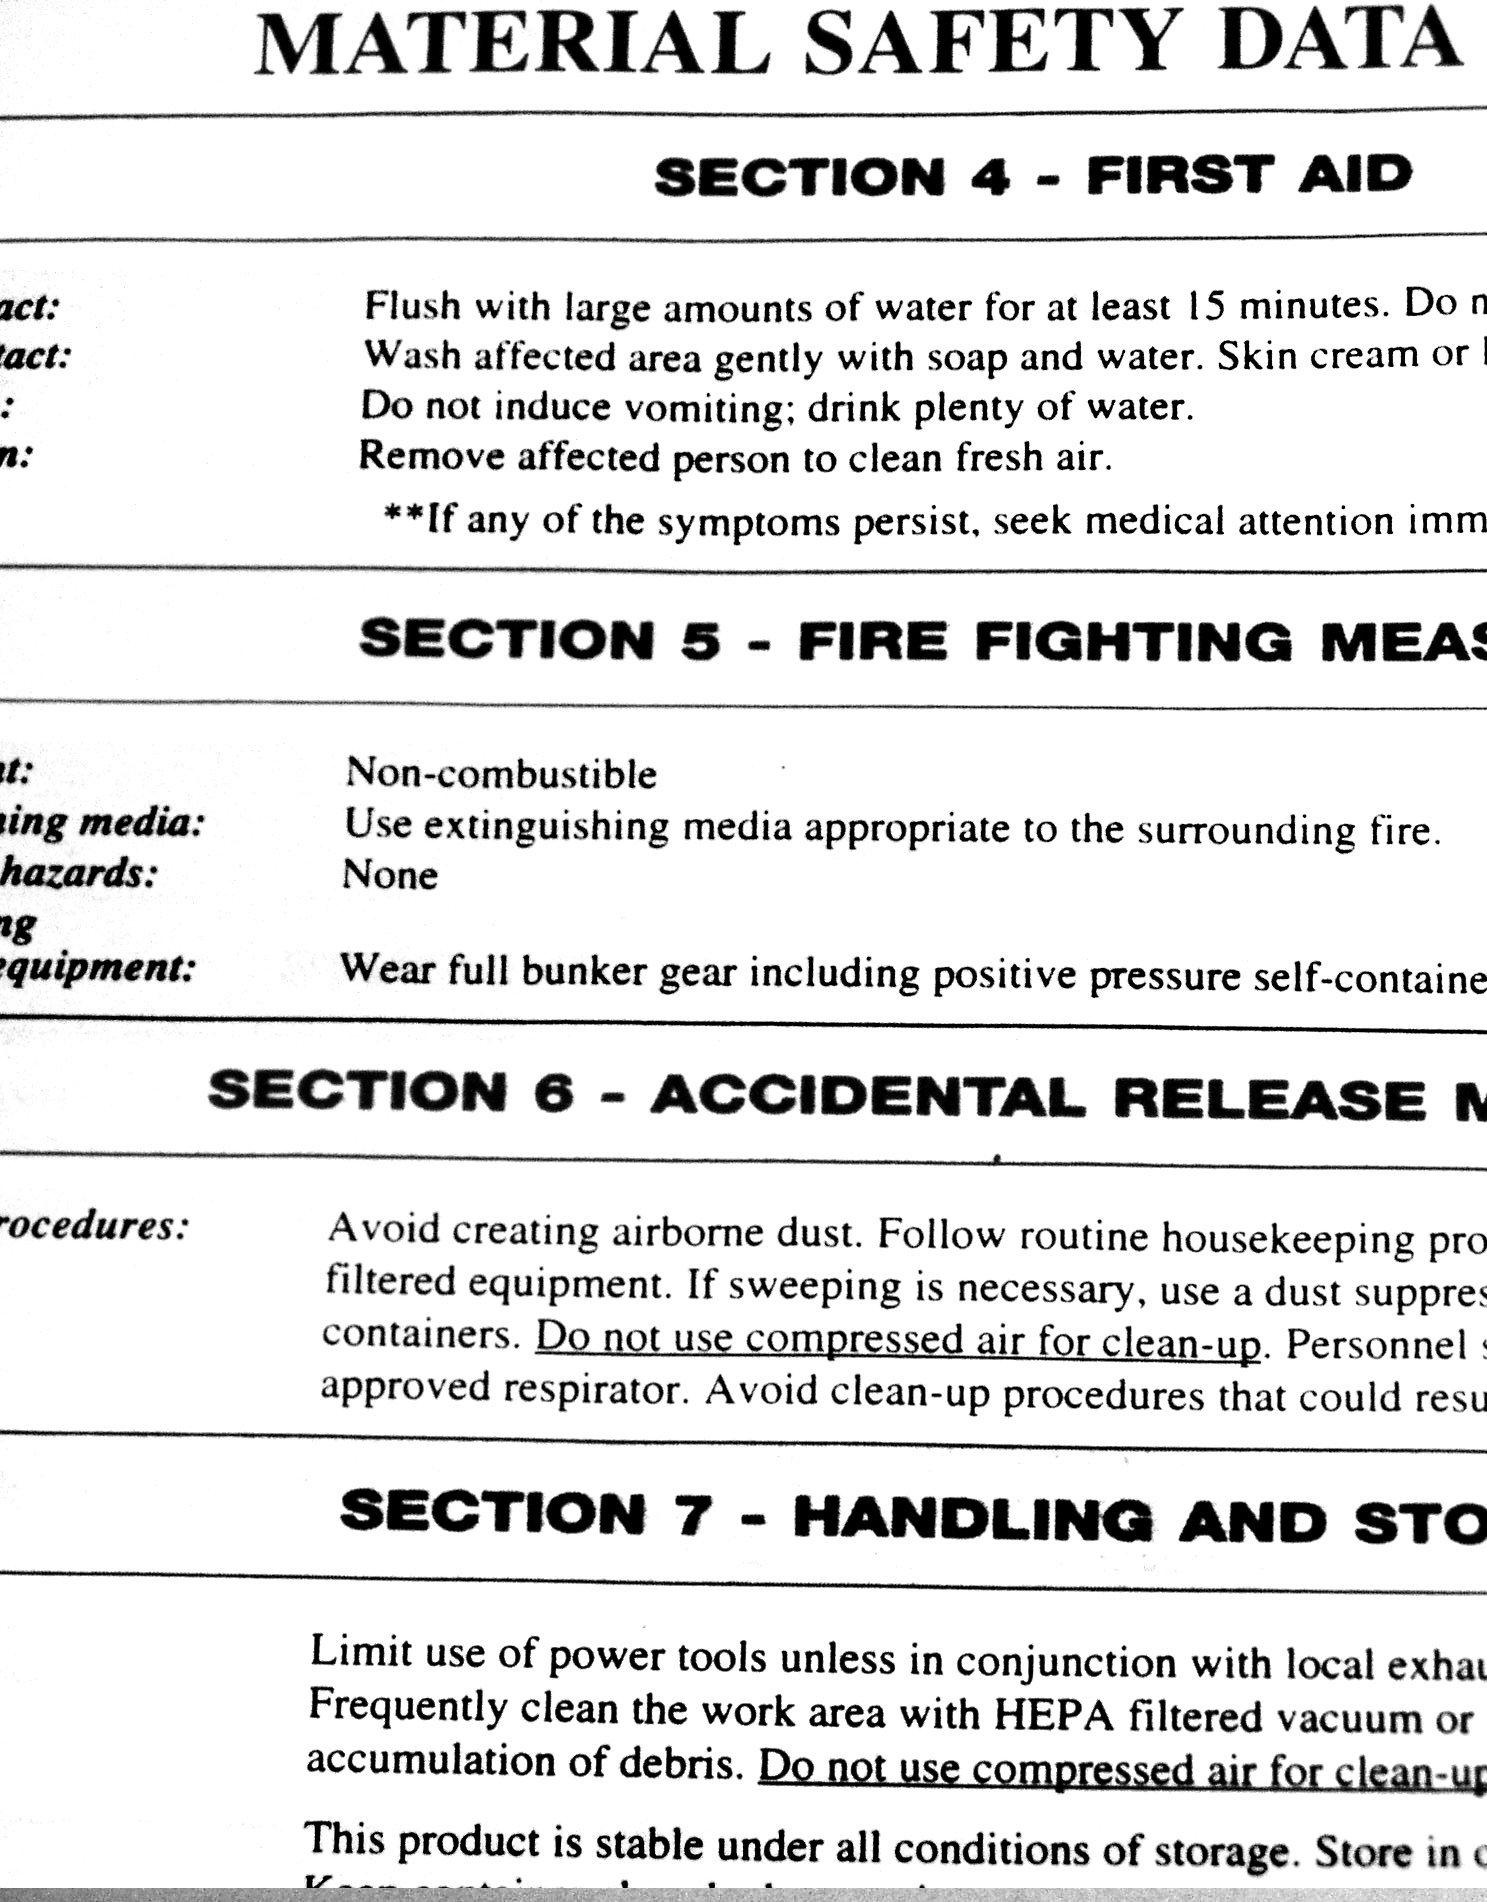 description material safety data sheet jpg